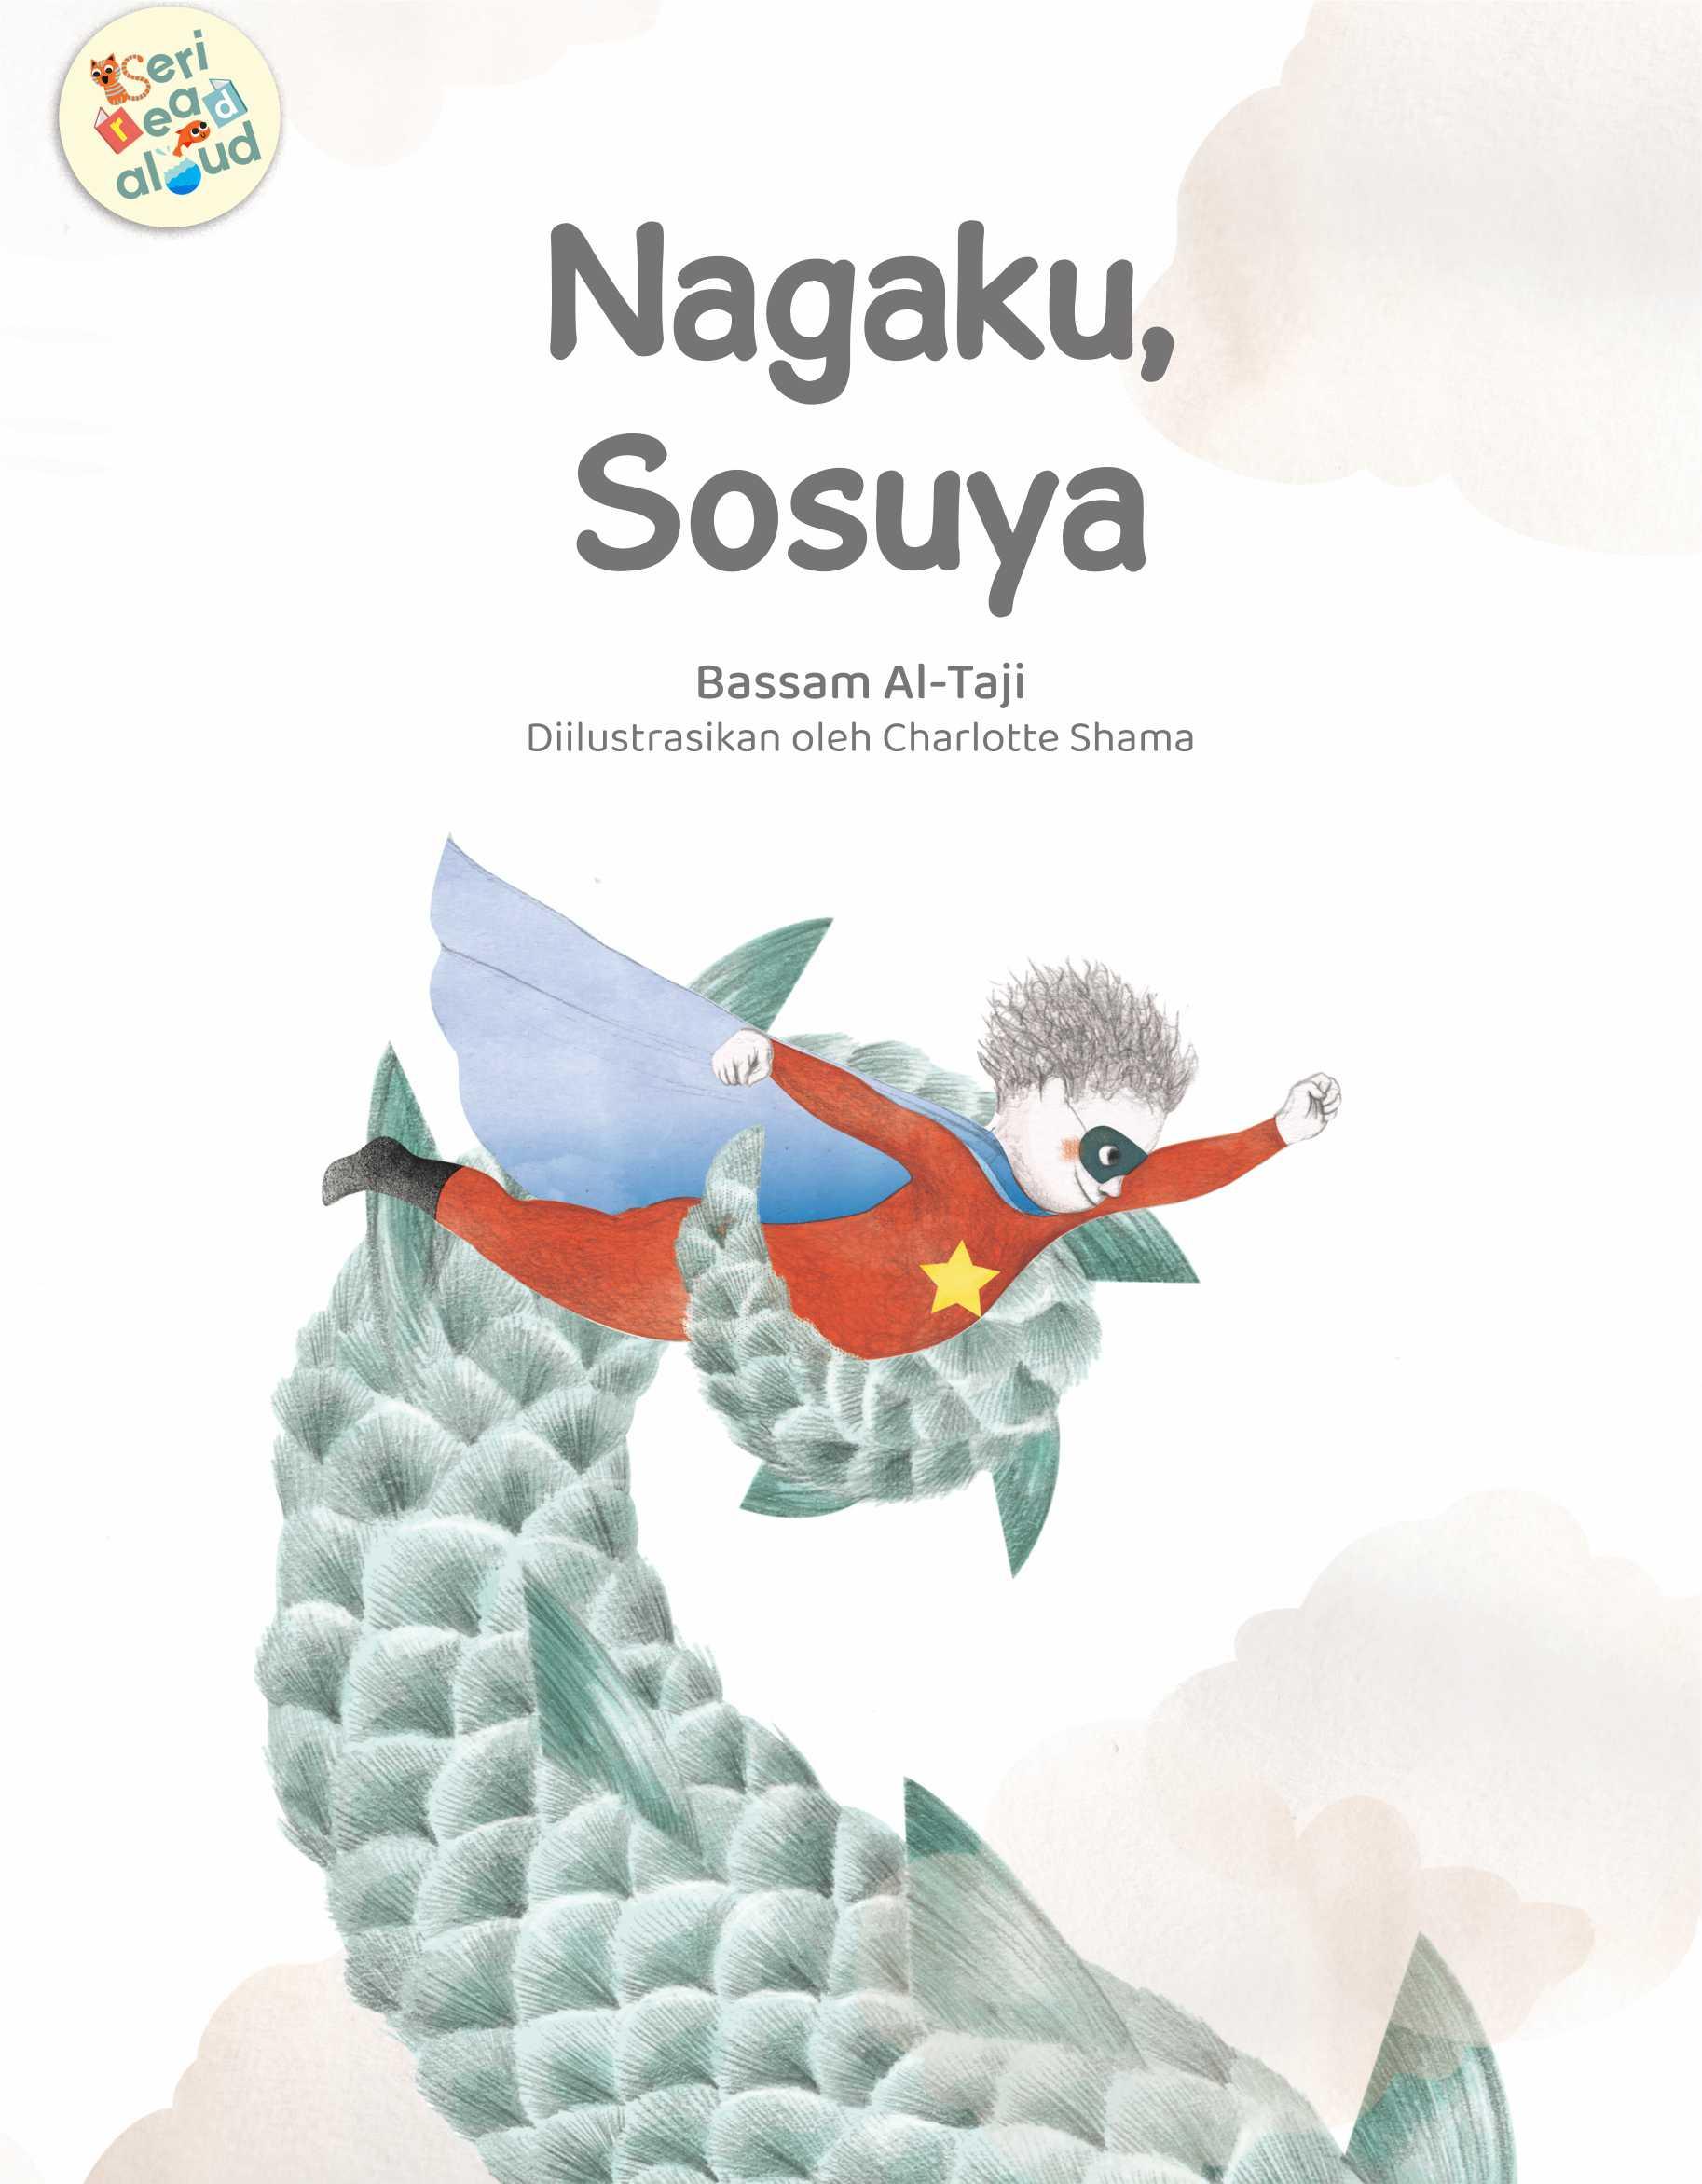 Nagaku, Sosuya [sumber elektronis]